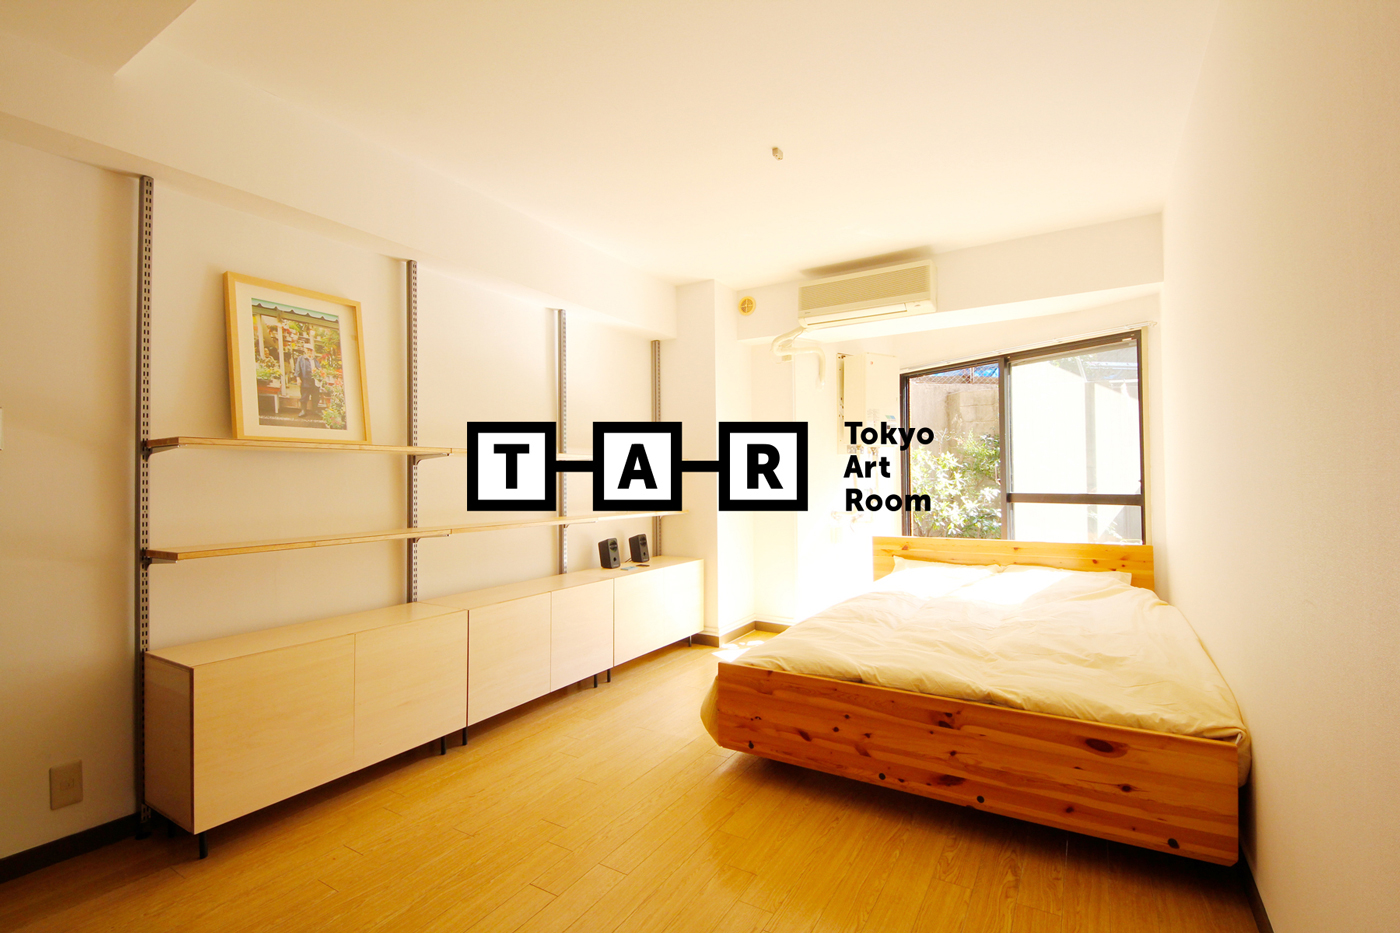 Tokyo Art Room | Identity on Behance